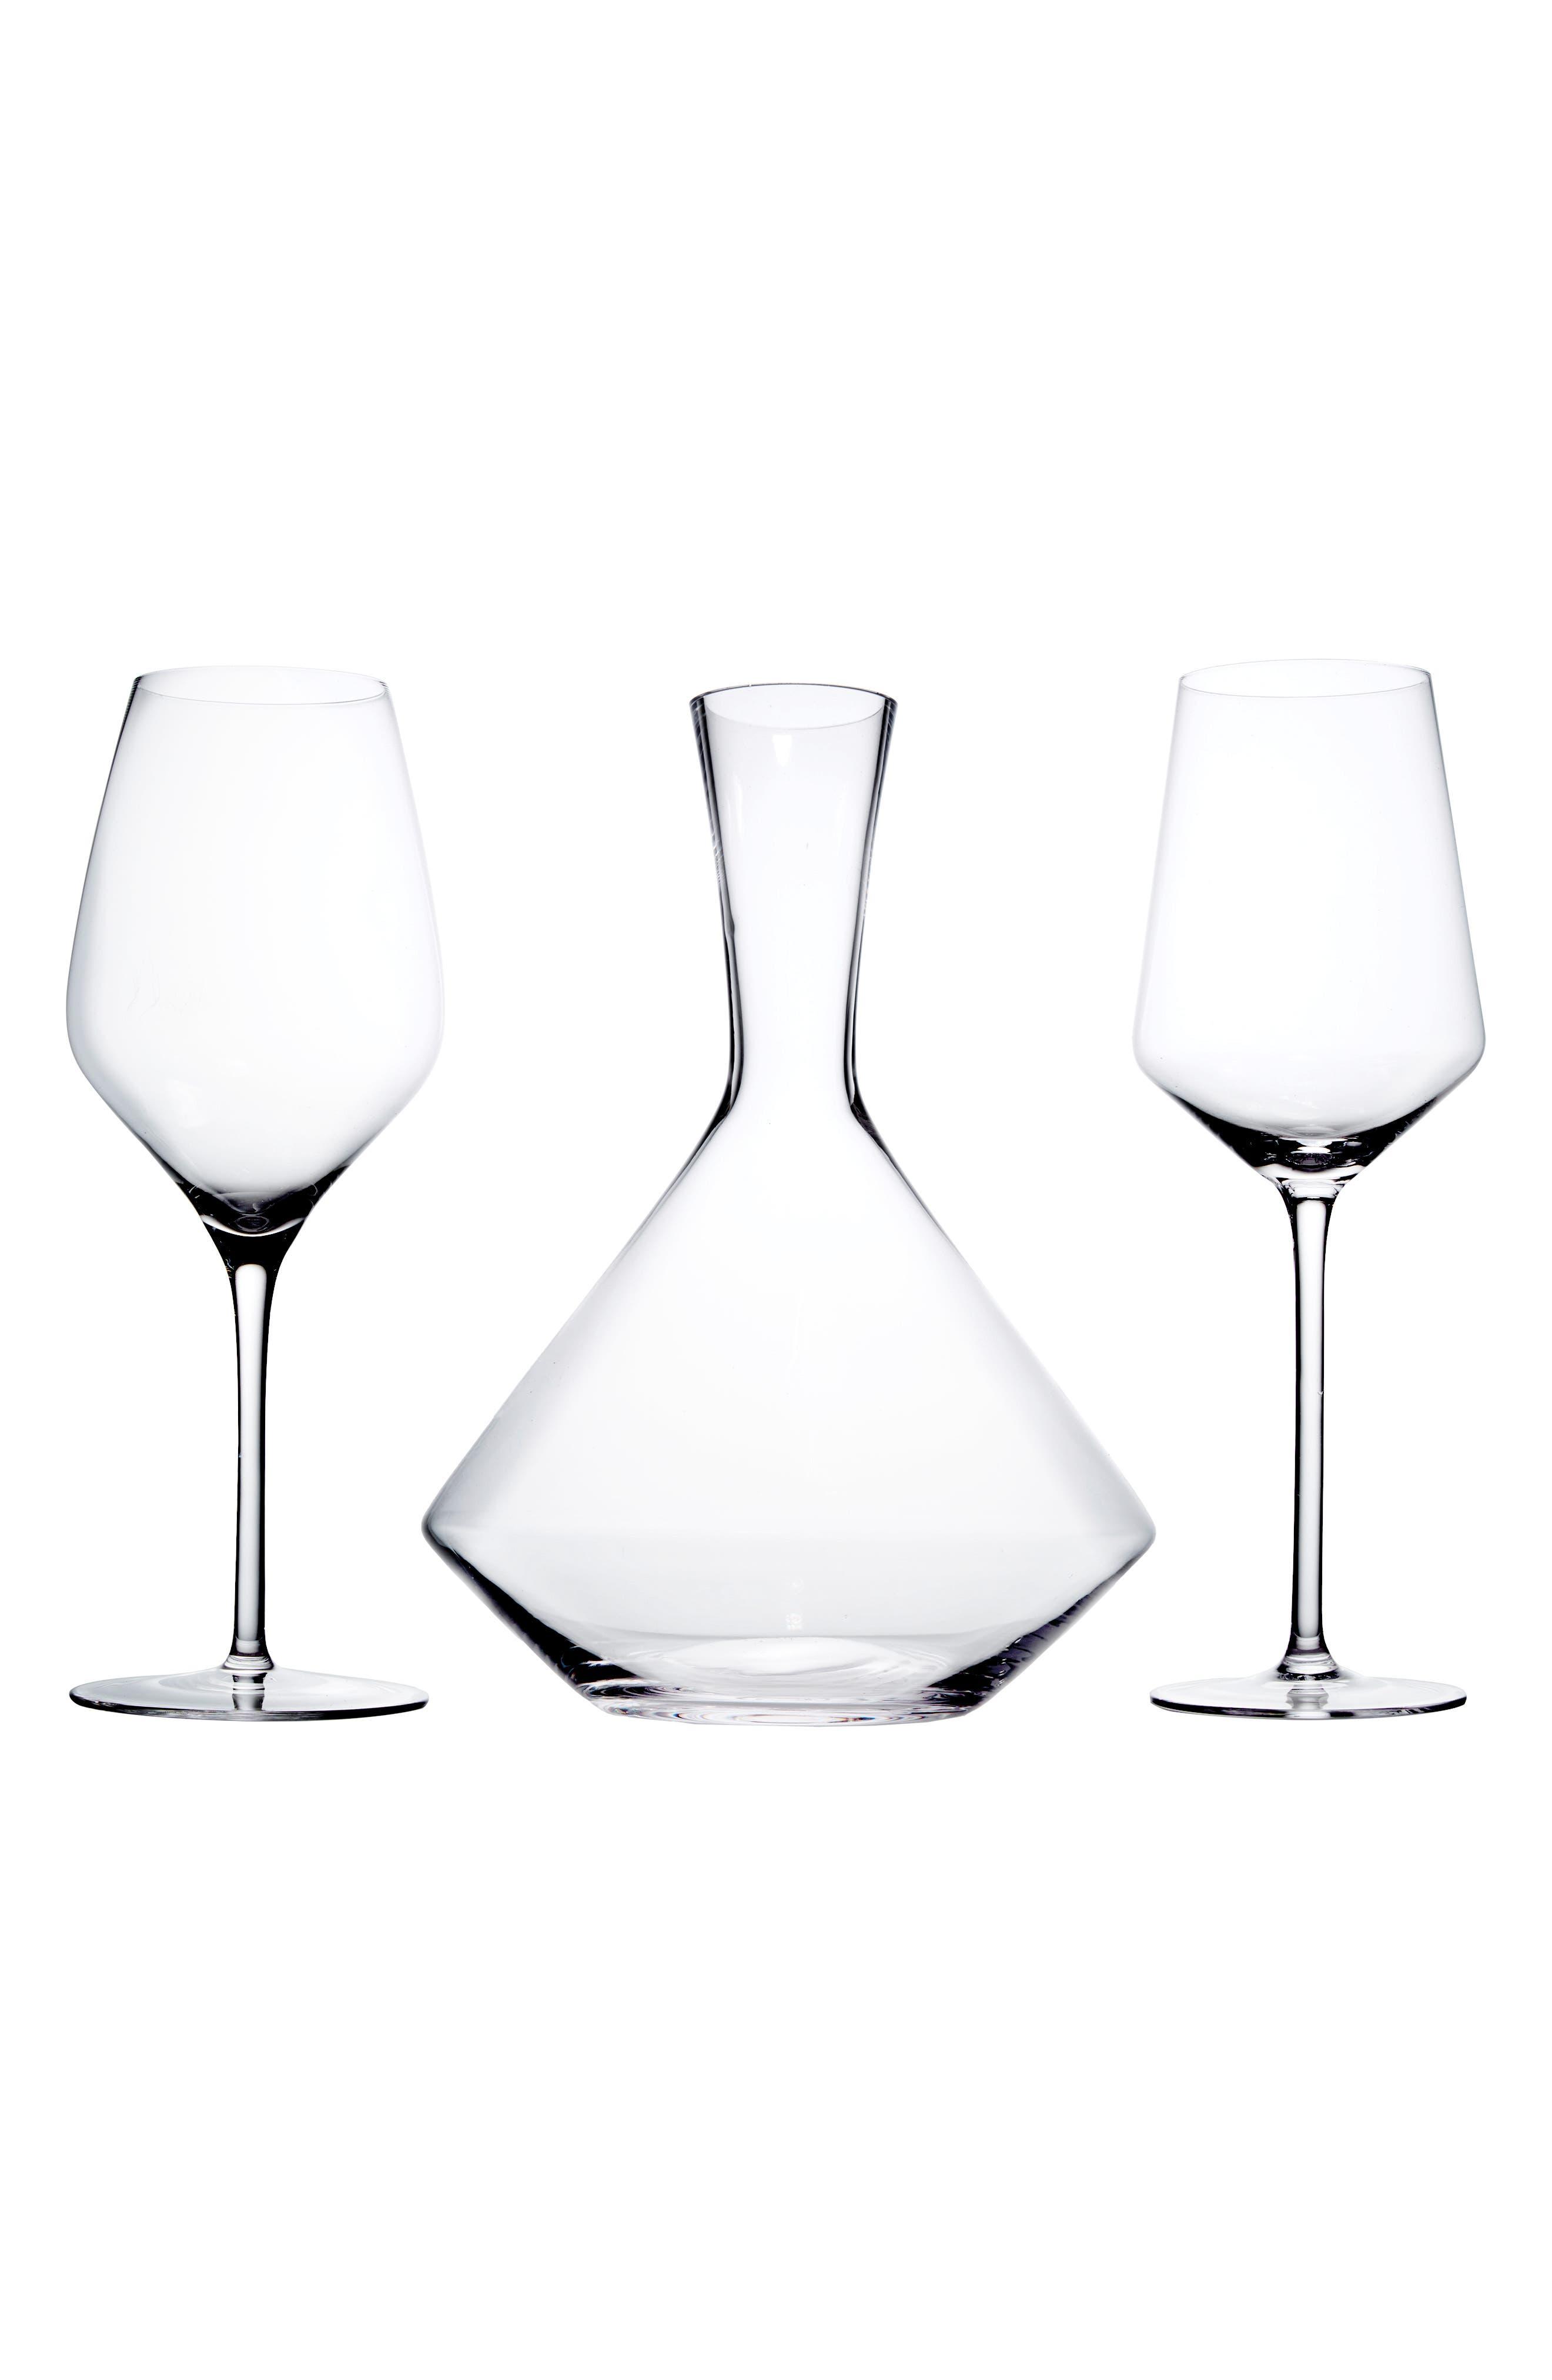 Raye Bordeaux 3-Piece Decanter Set,                             Main thumbnail 1, color,                             White